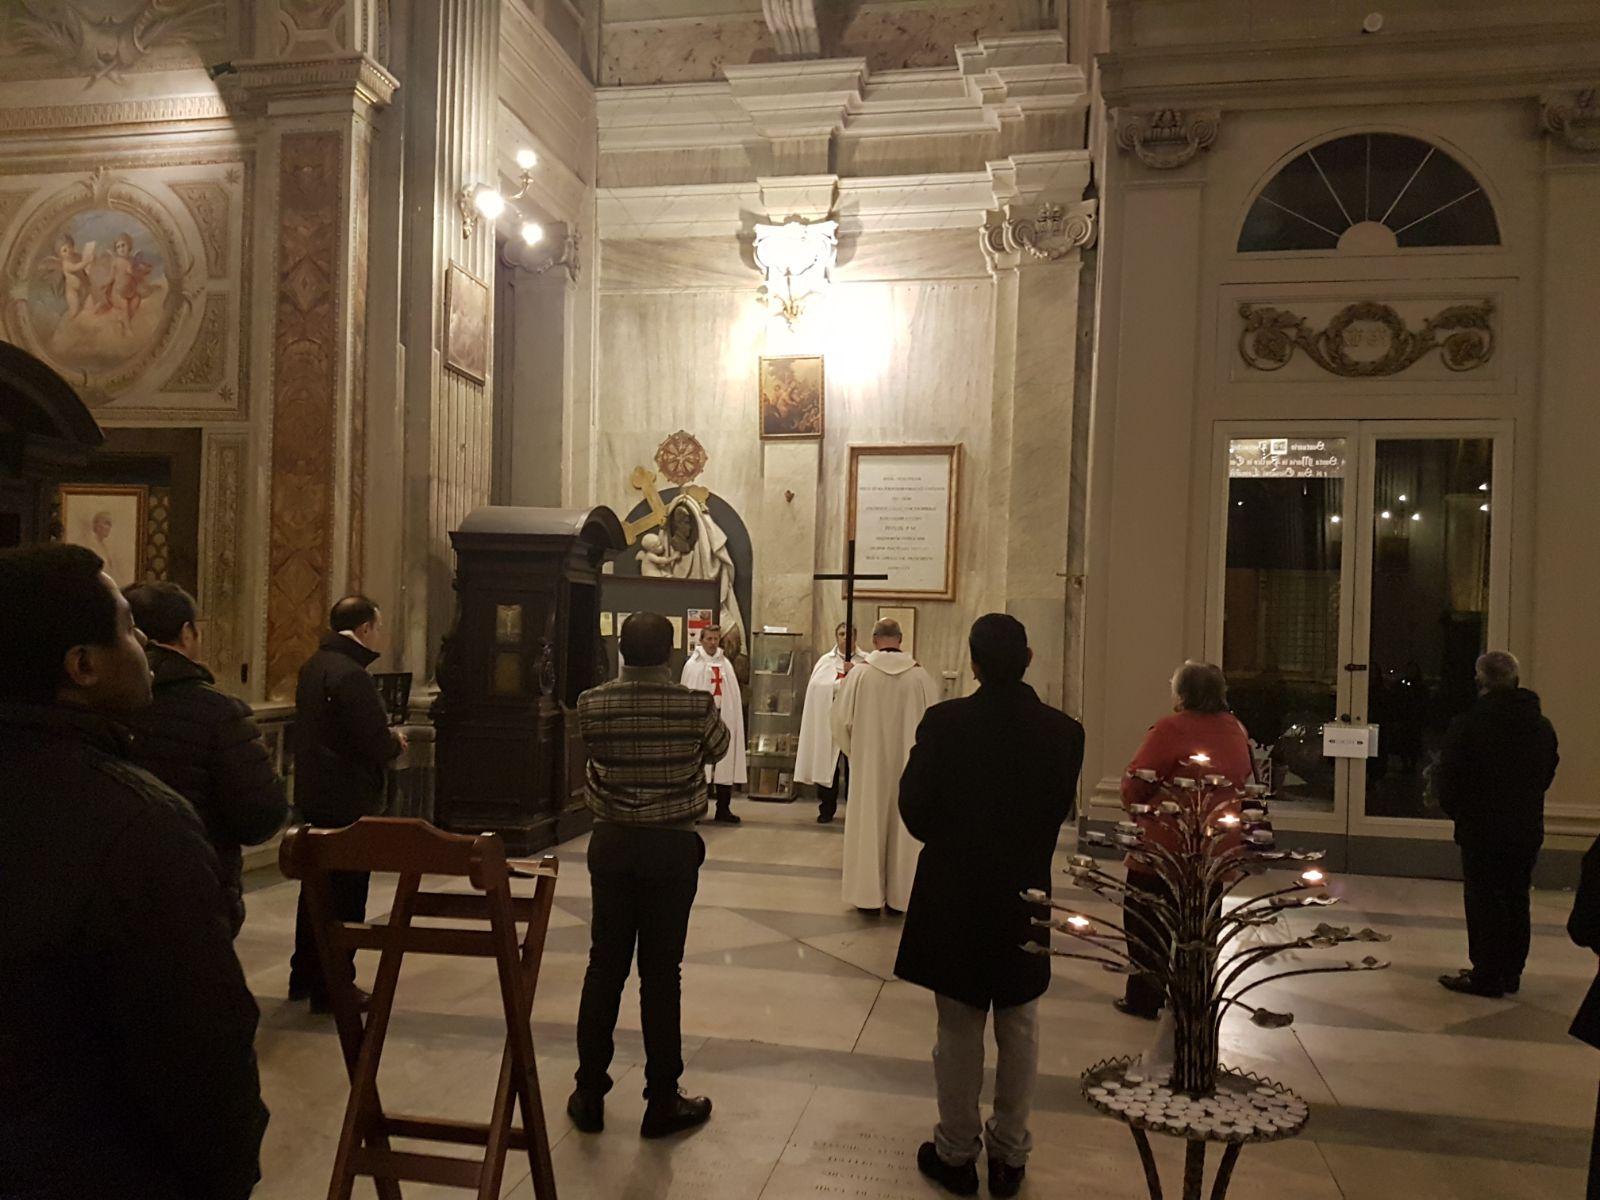 16feb2018 - Basilica di Santa Maria in Portico in Campitelli - Via Crucis - Templari Cattolici - foto 4